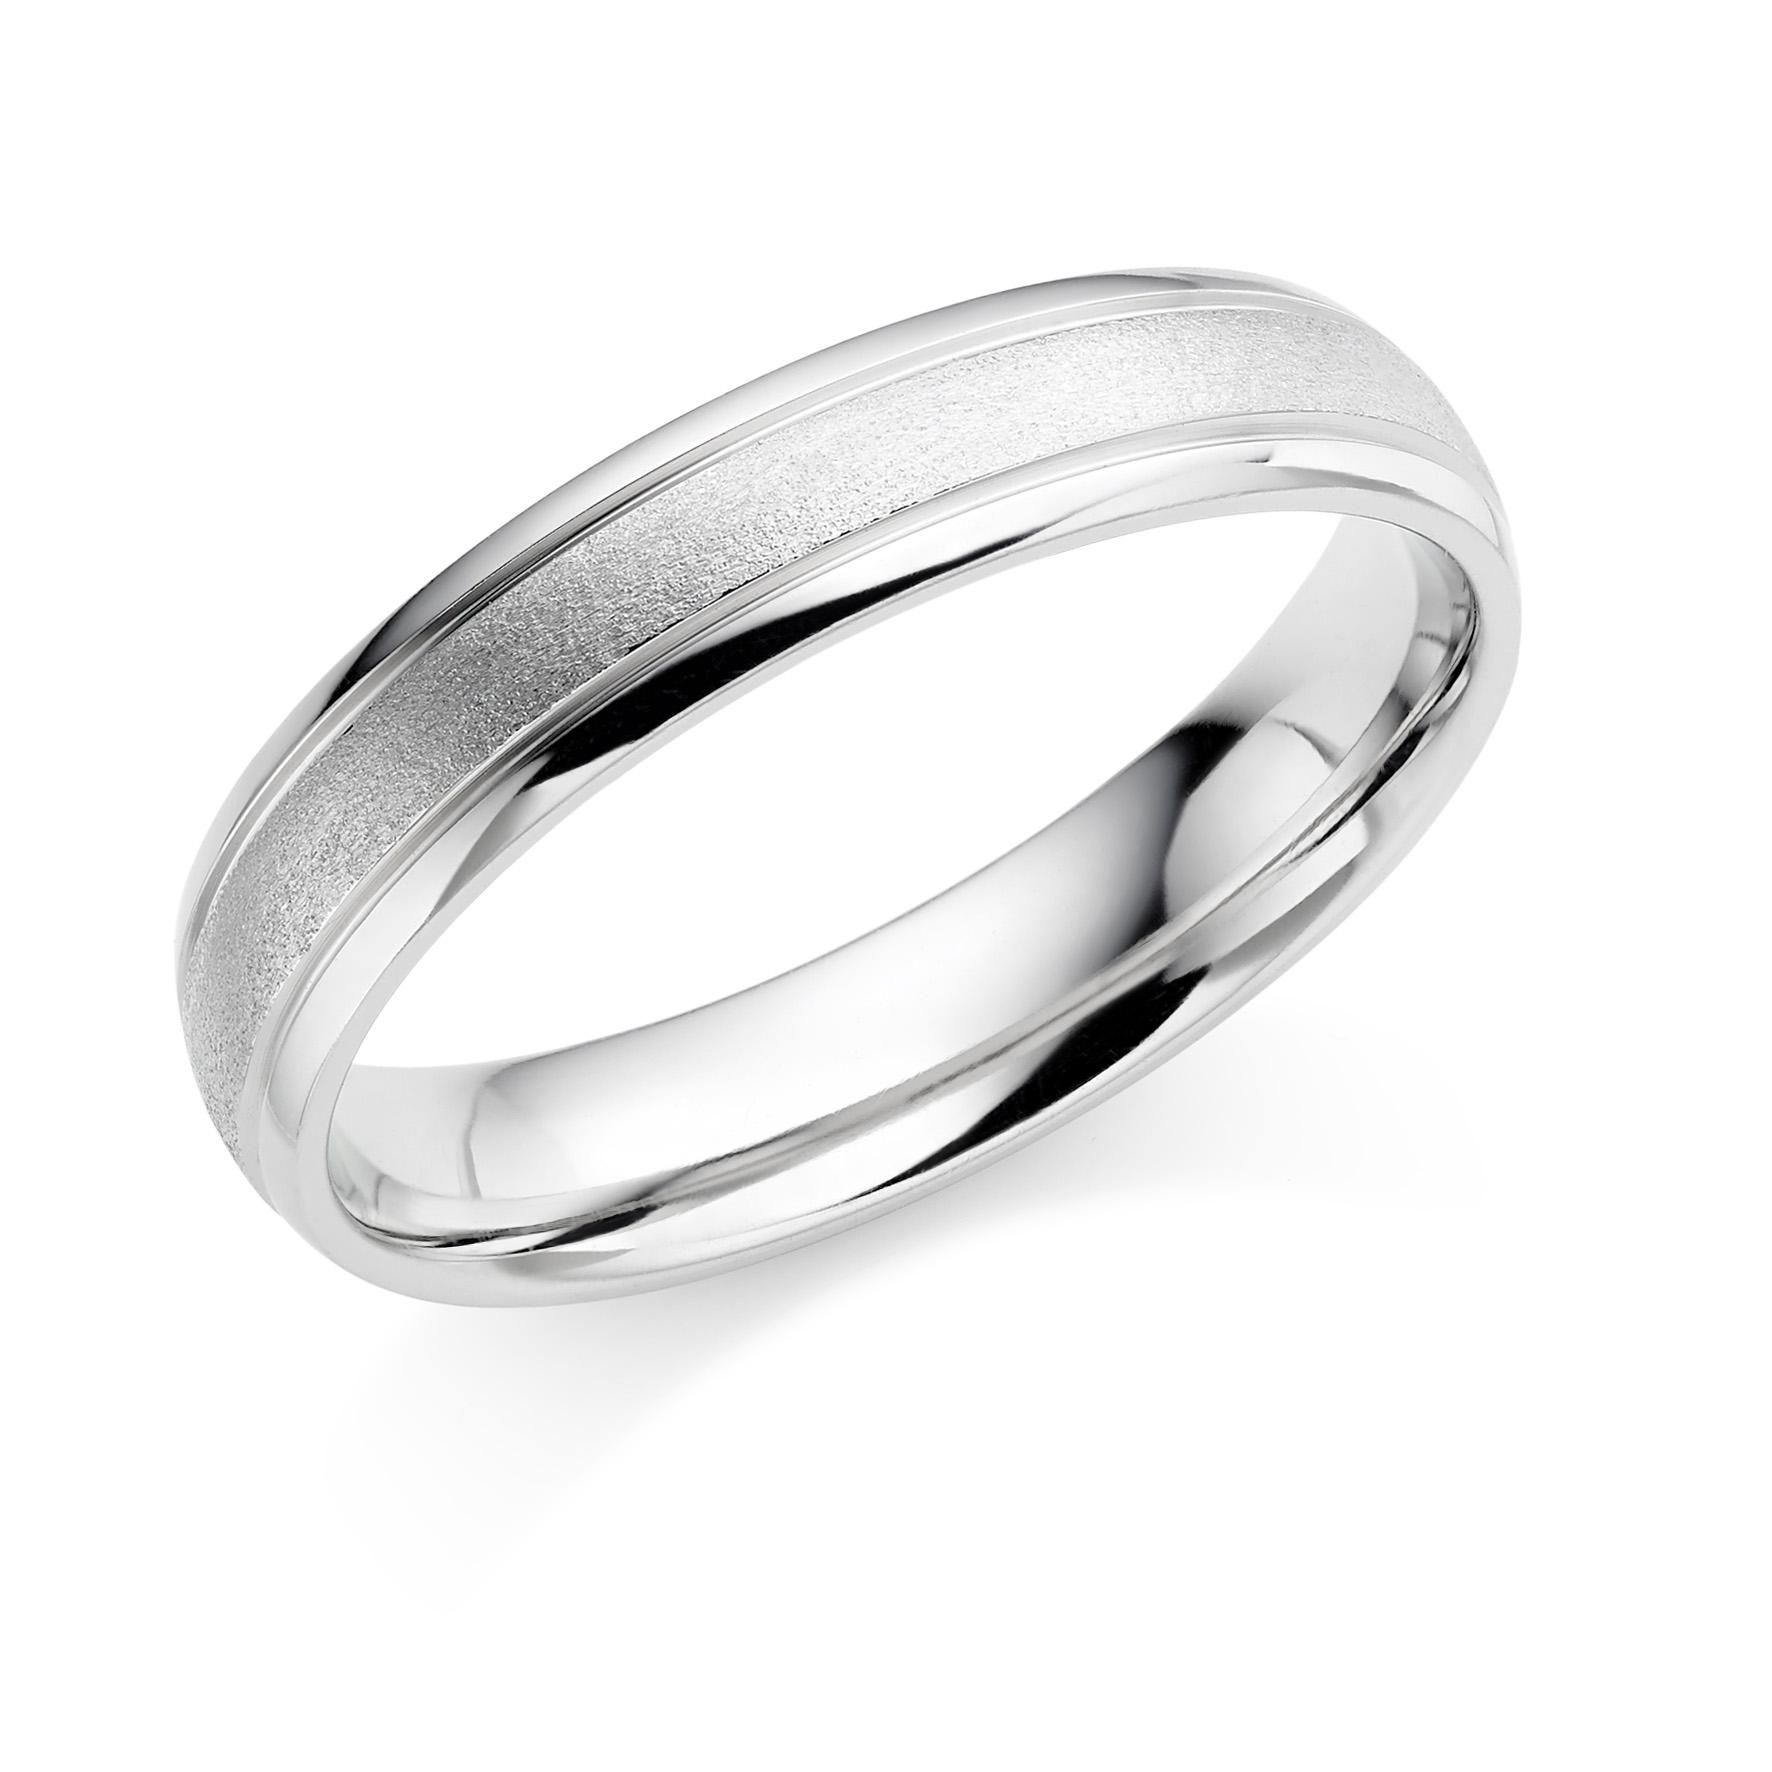 A Platinum Wedding Ring